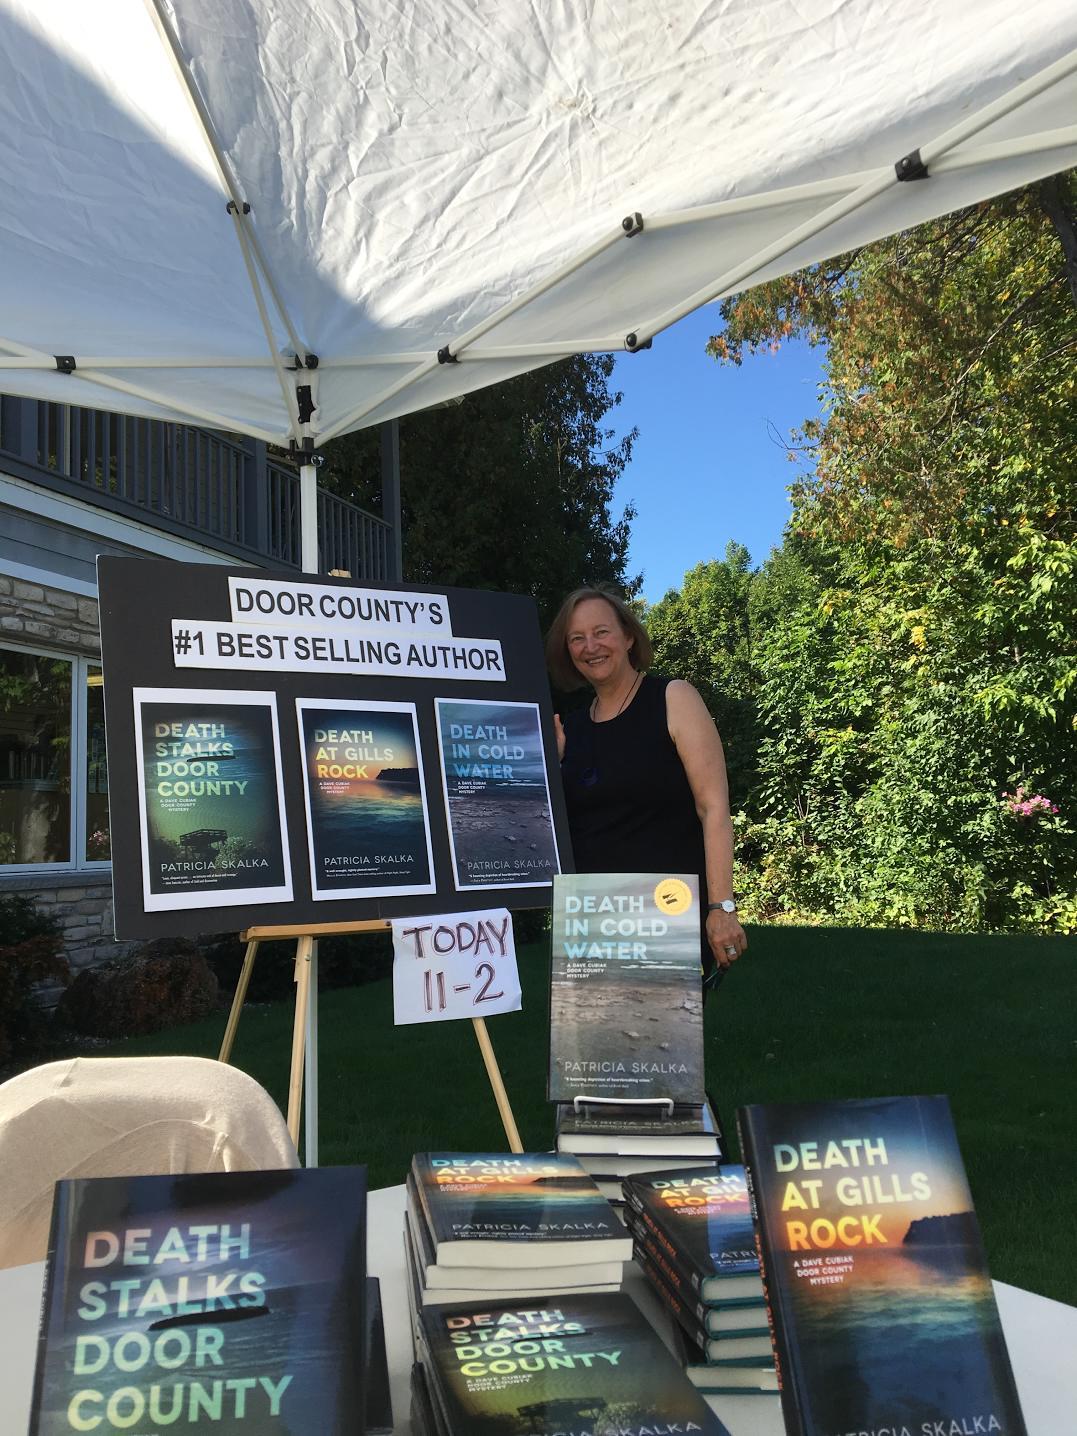 The Peninsula Bookman, Fish Creek WI, September 2017. Photo by Phillip Schneider